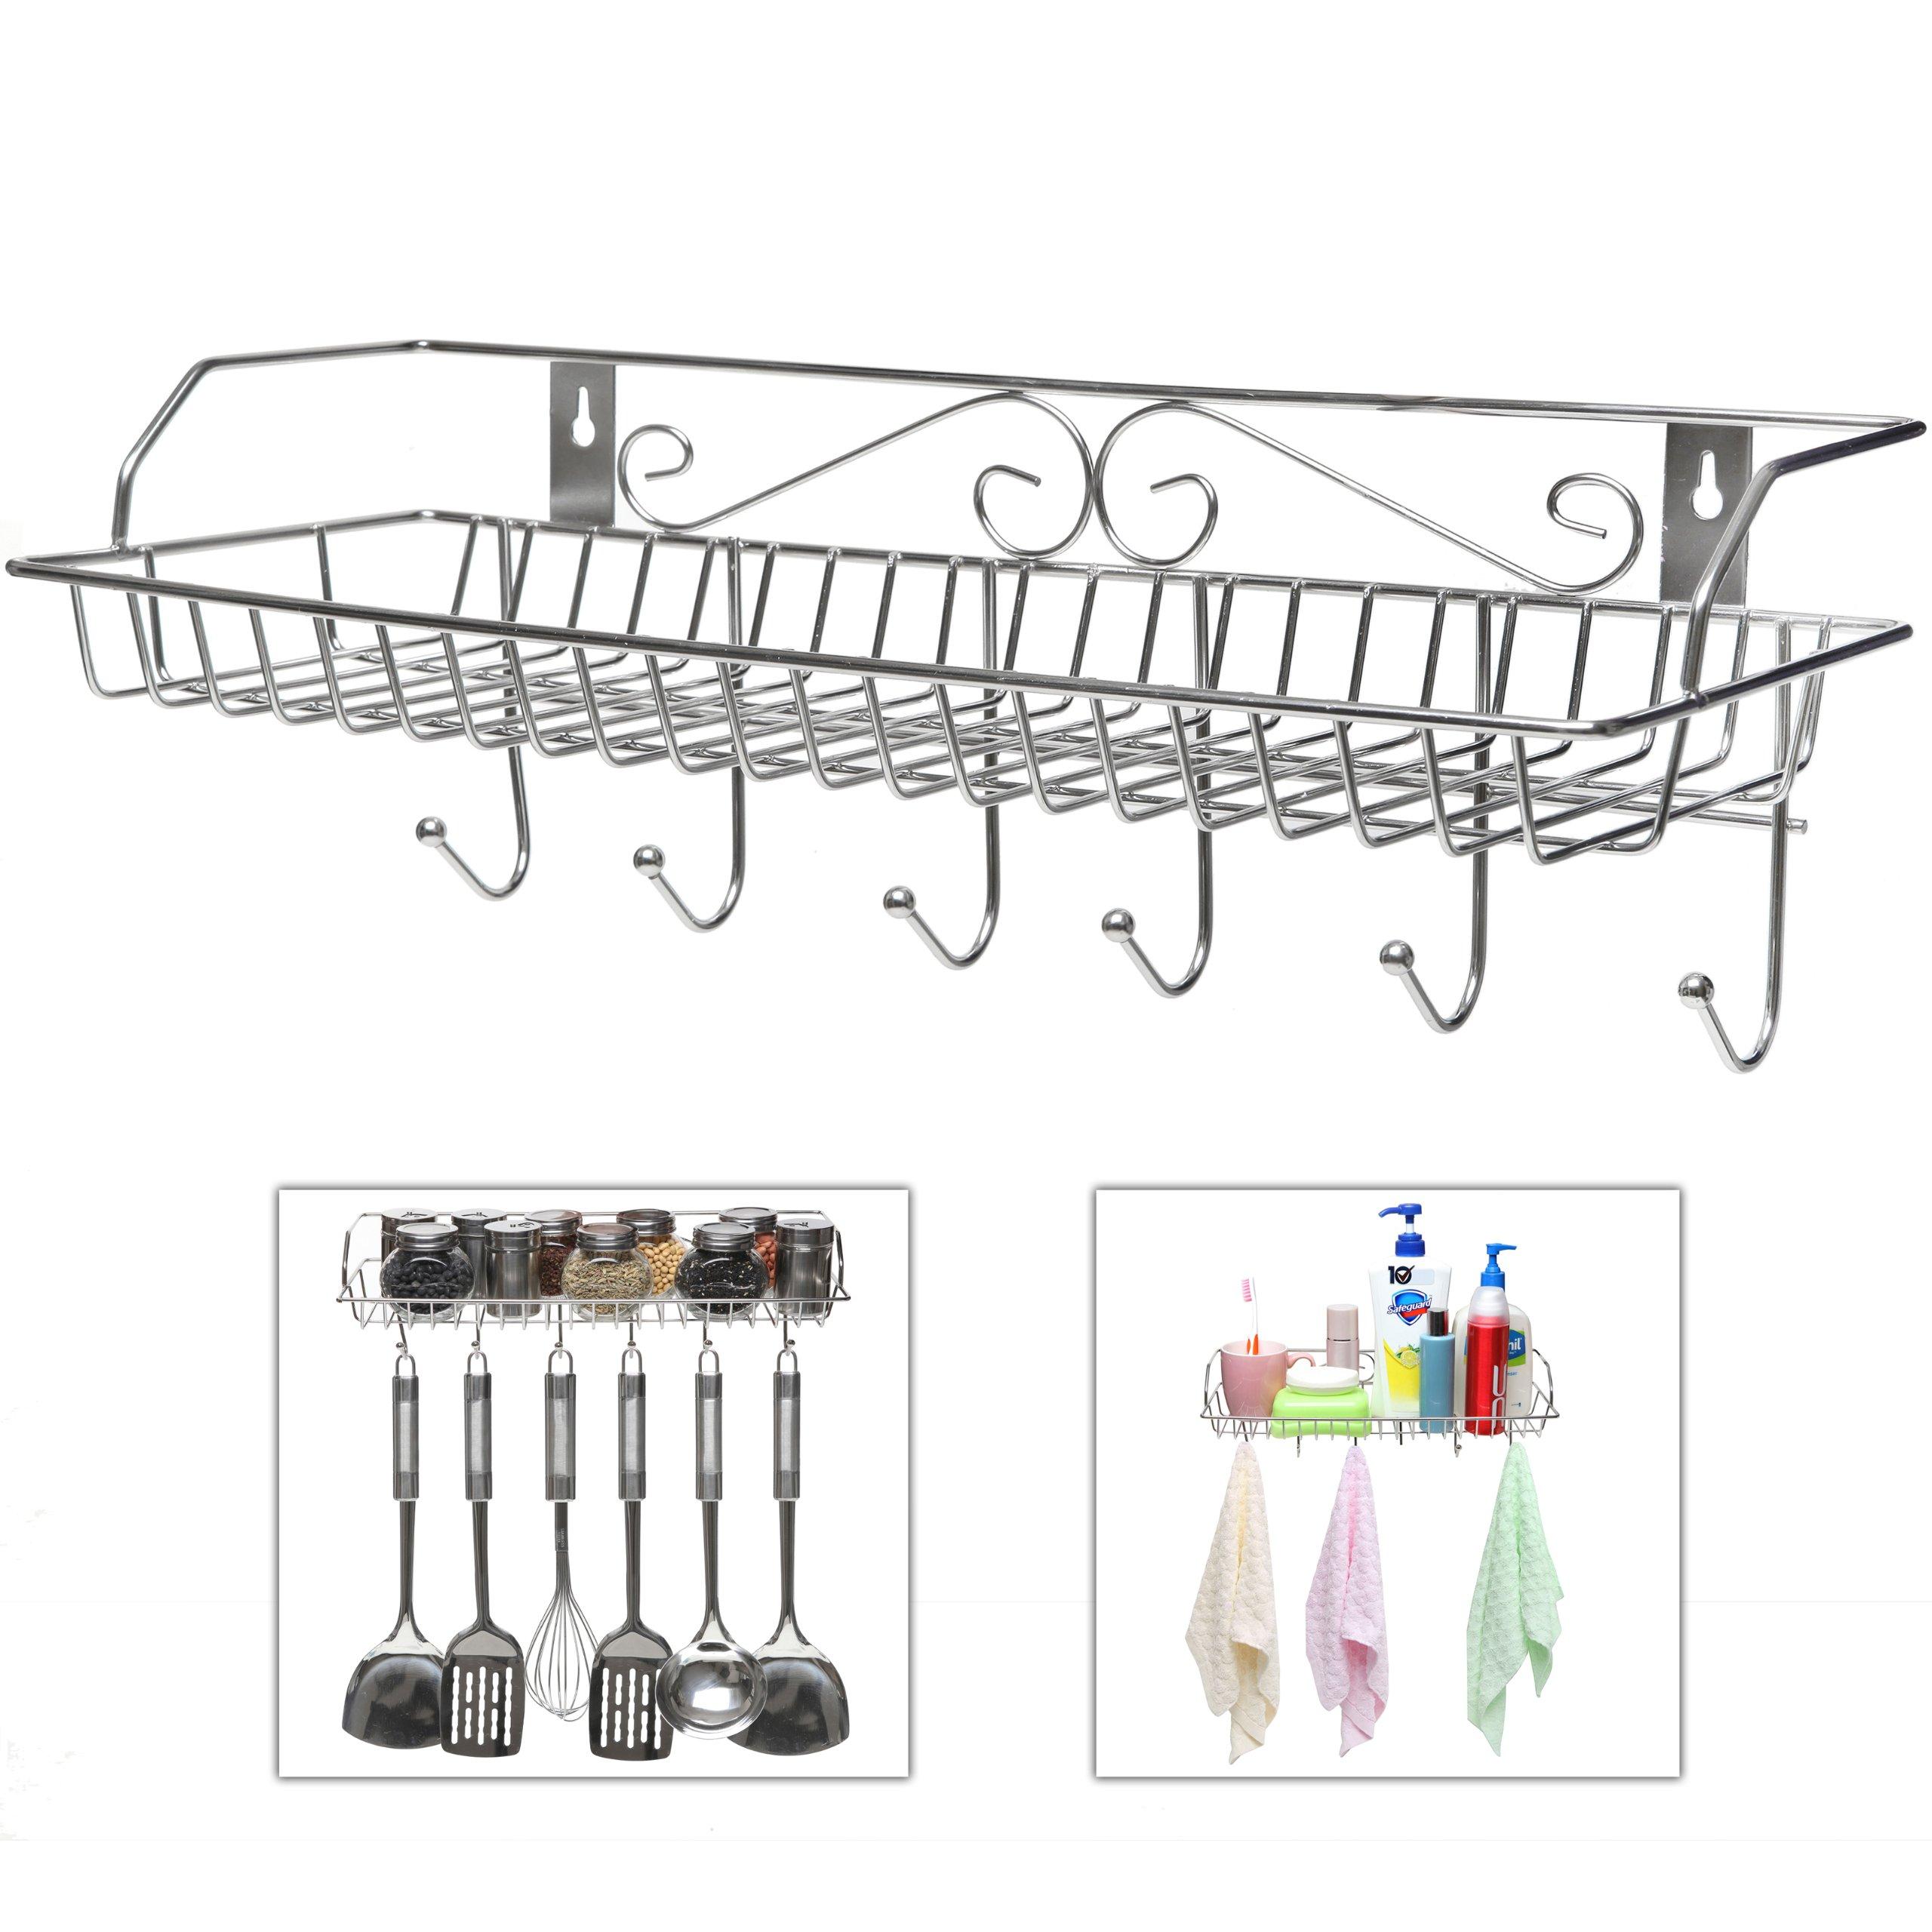 MyGift Stainless Steel Metal Wall Mounted Organizer Hanger/Storage Rack w/Top Basket Shelf, 6 Utility Hooks